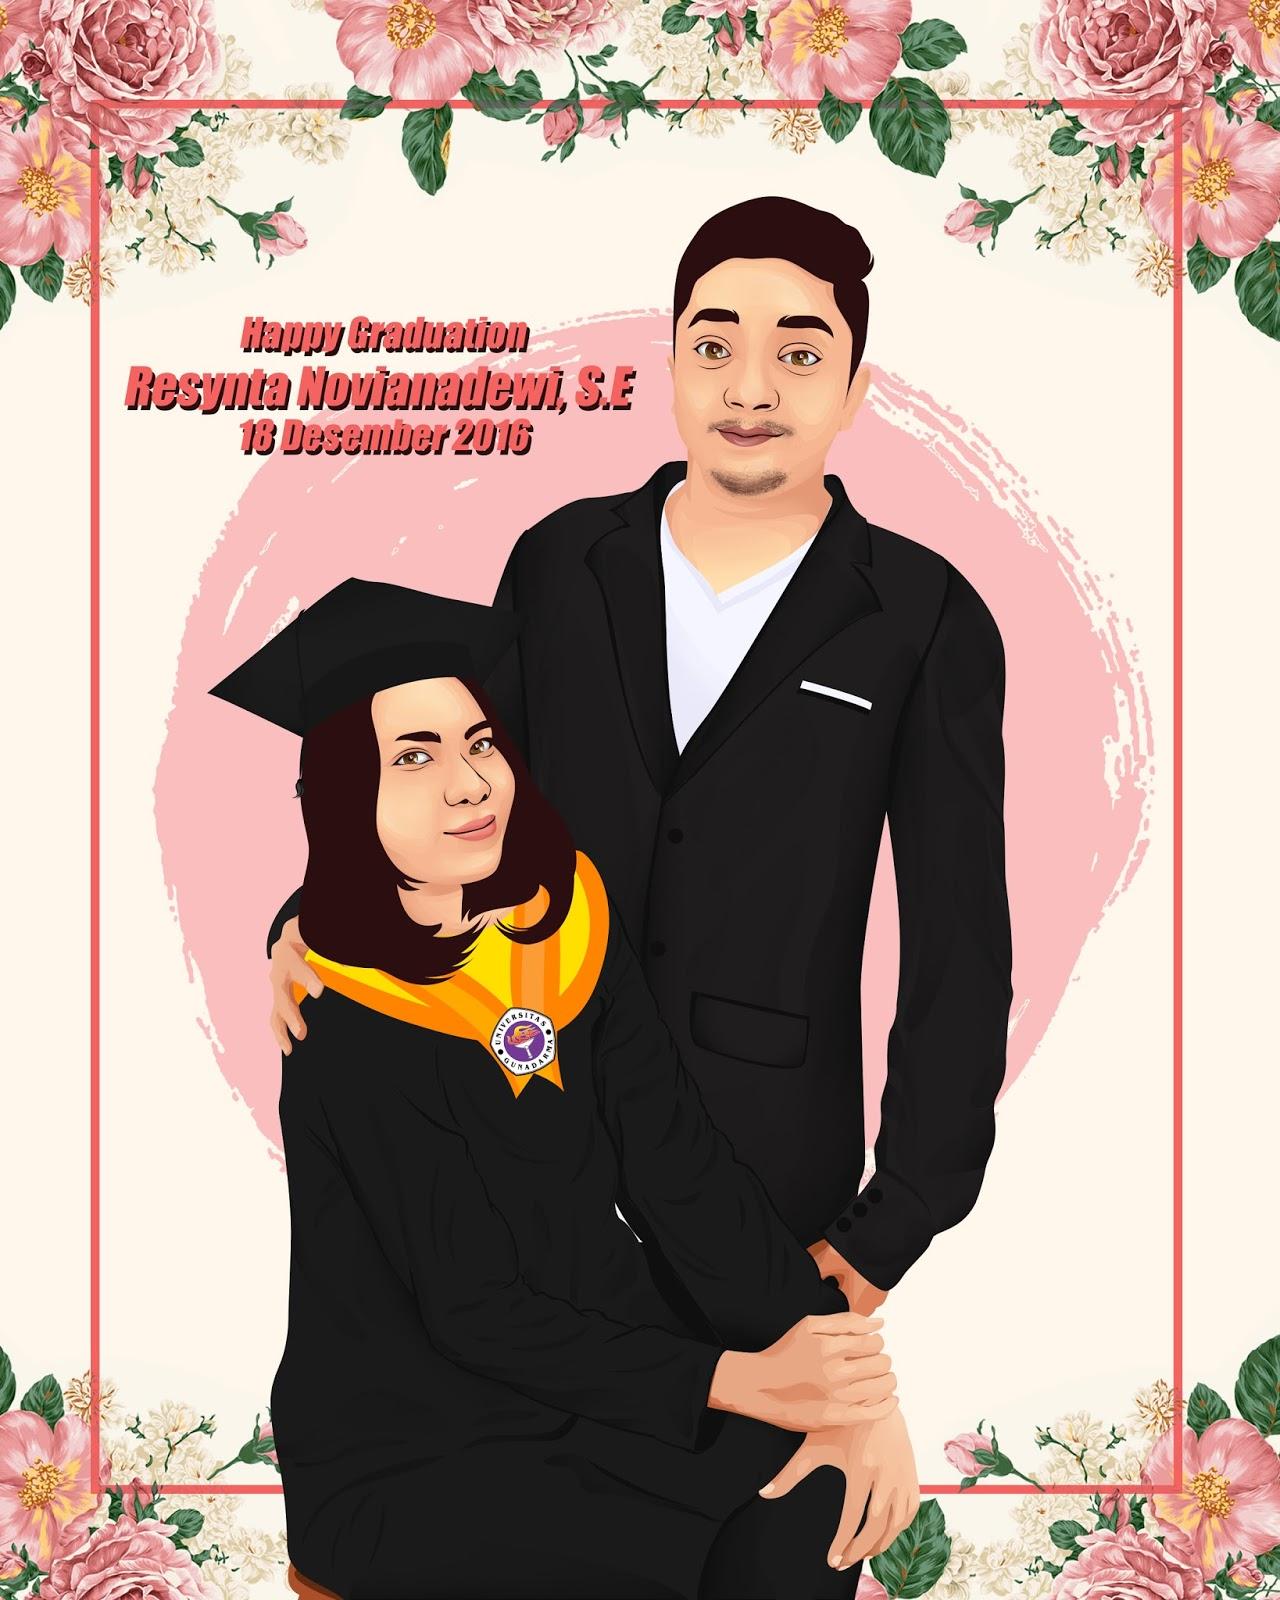 Jual Kado Pernikahan Kartun Wajah ARTupayscom